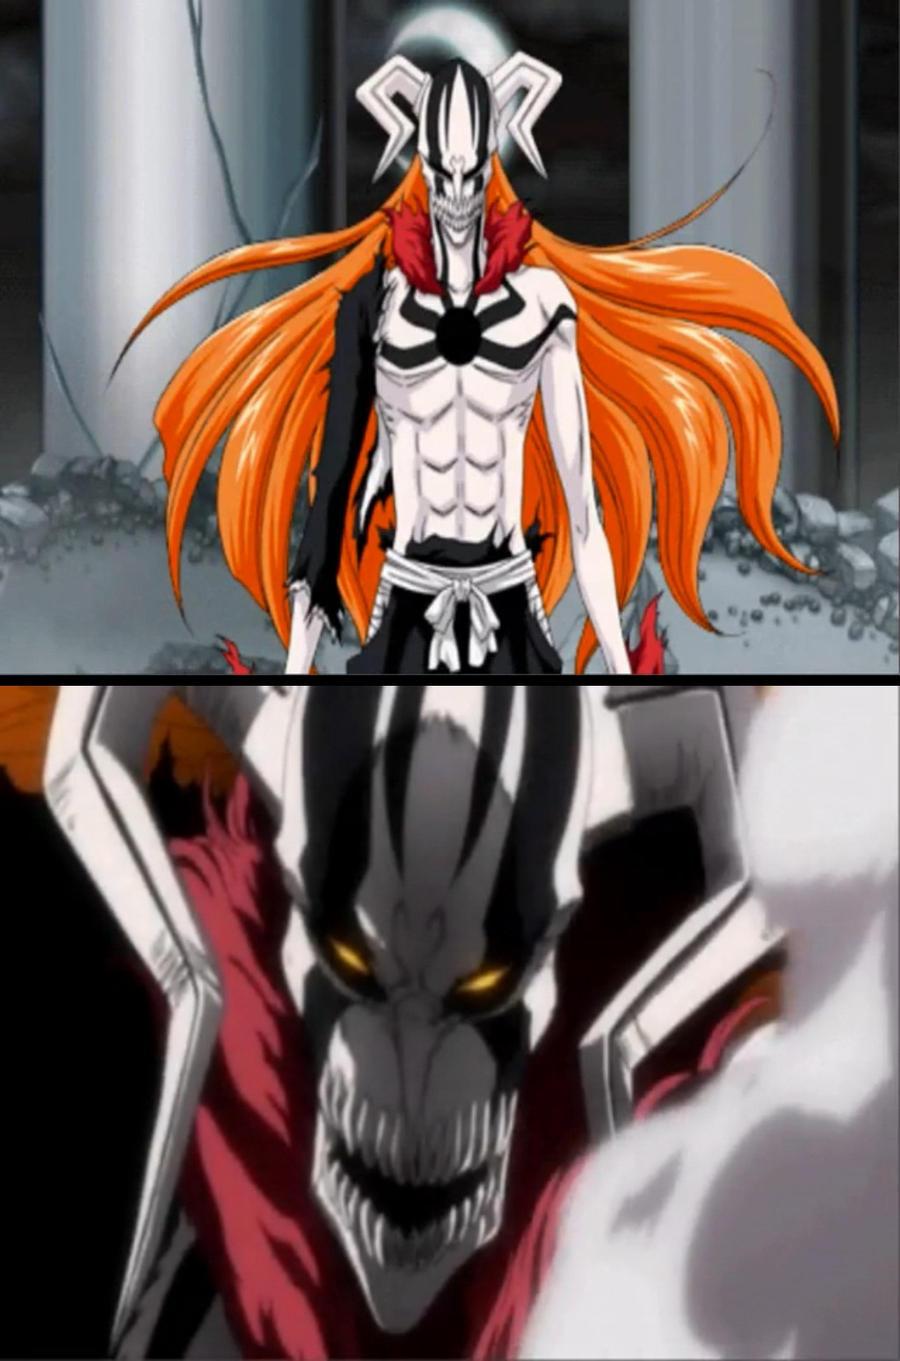 Hollow Ichigo full form by Abyss1 on DeviantArt